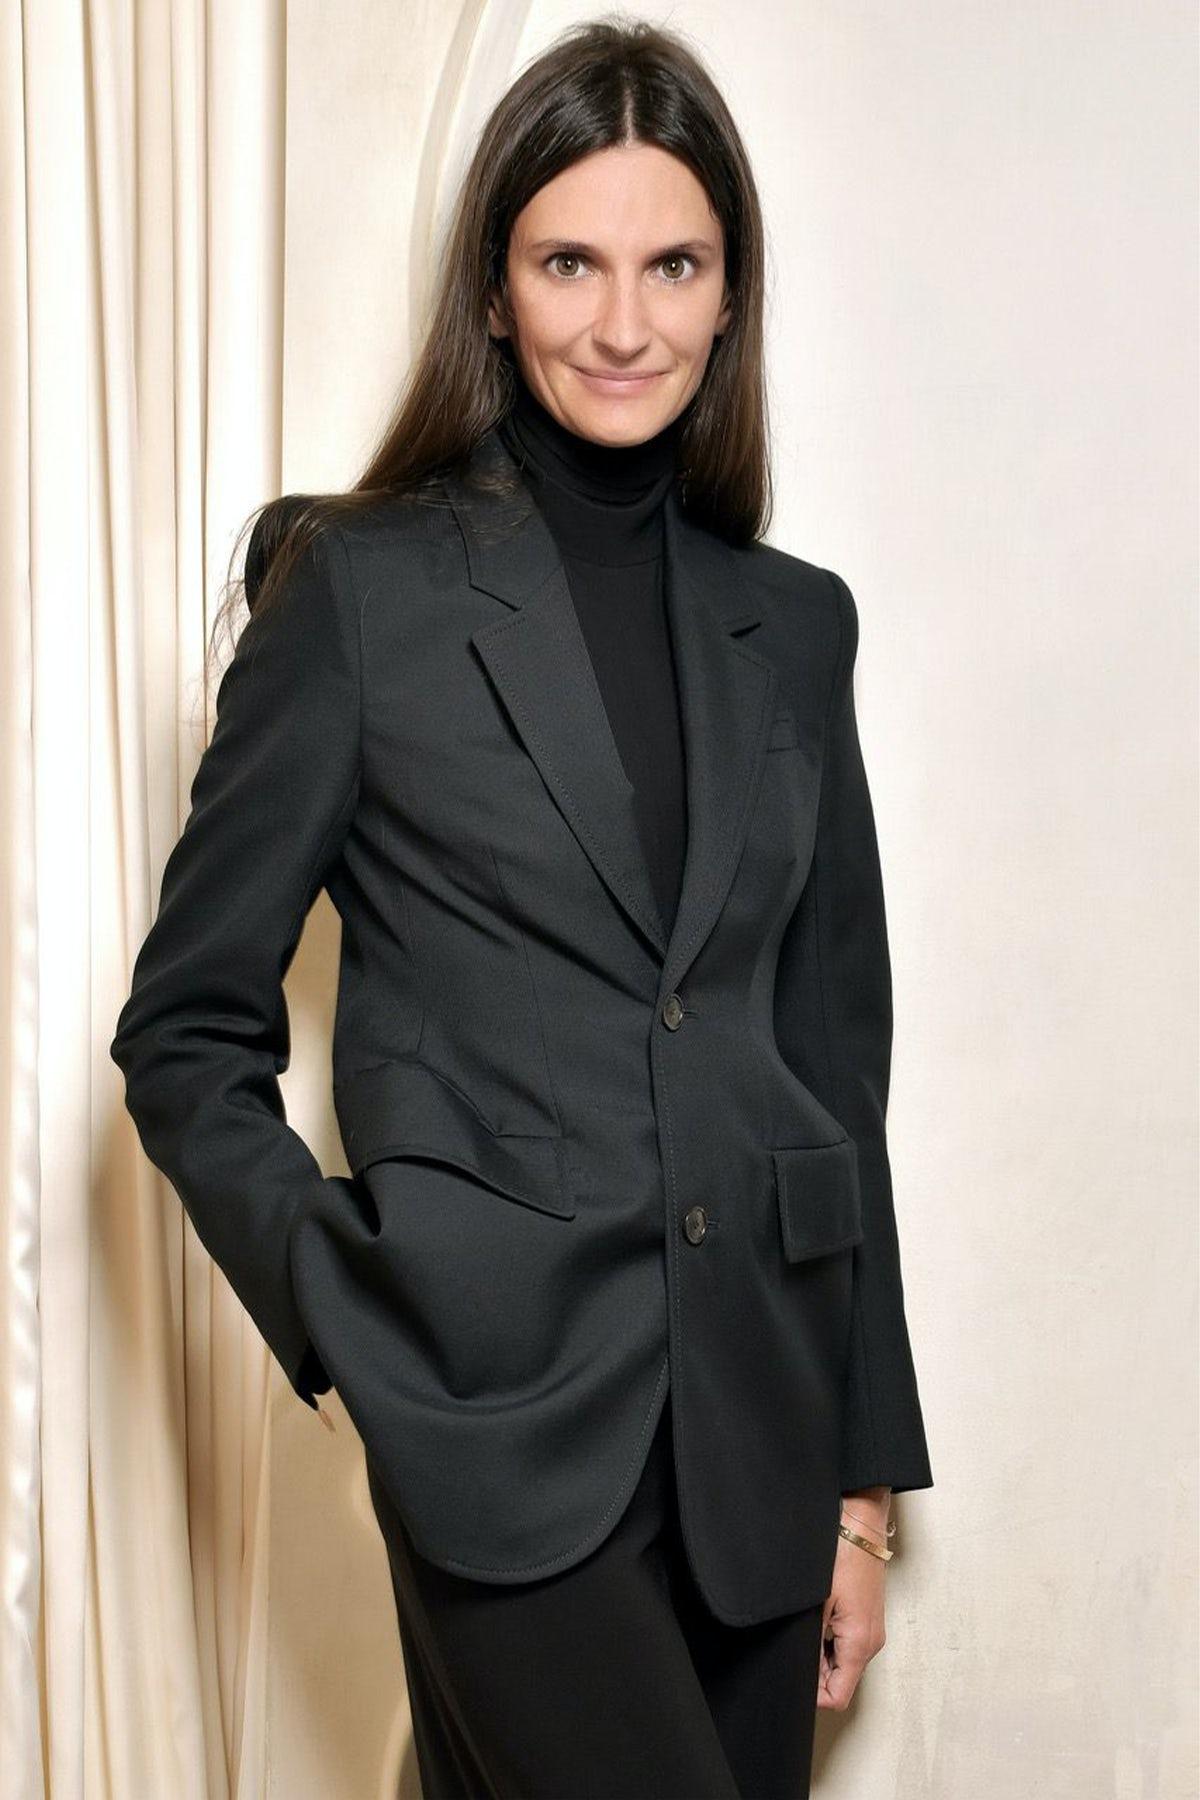 Balenciaga appoints Ludivine Pont as chief marketing officer. Balenciaga.